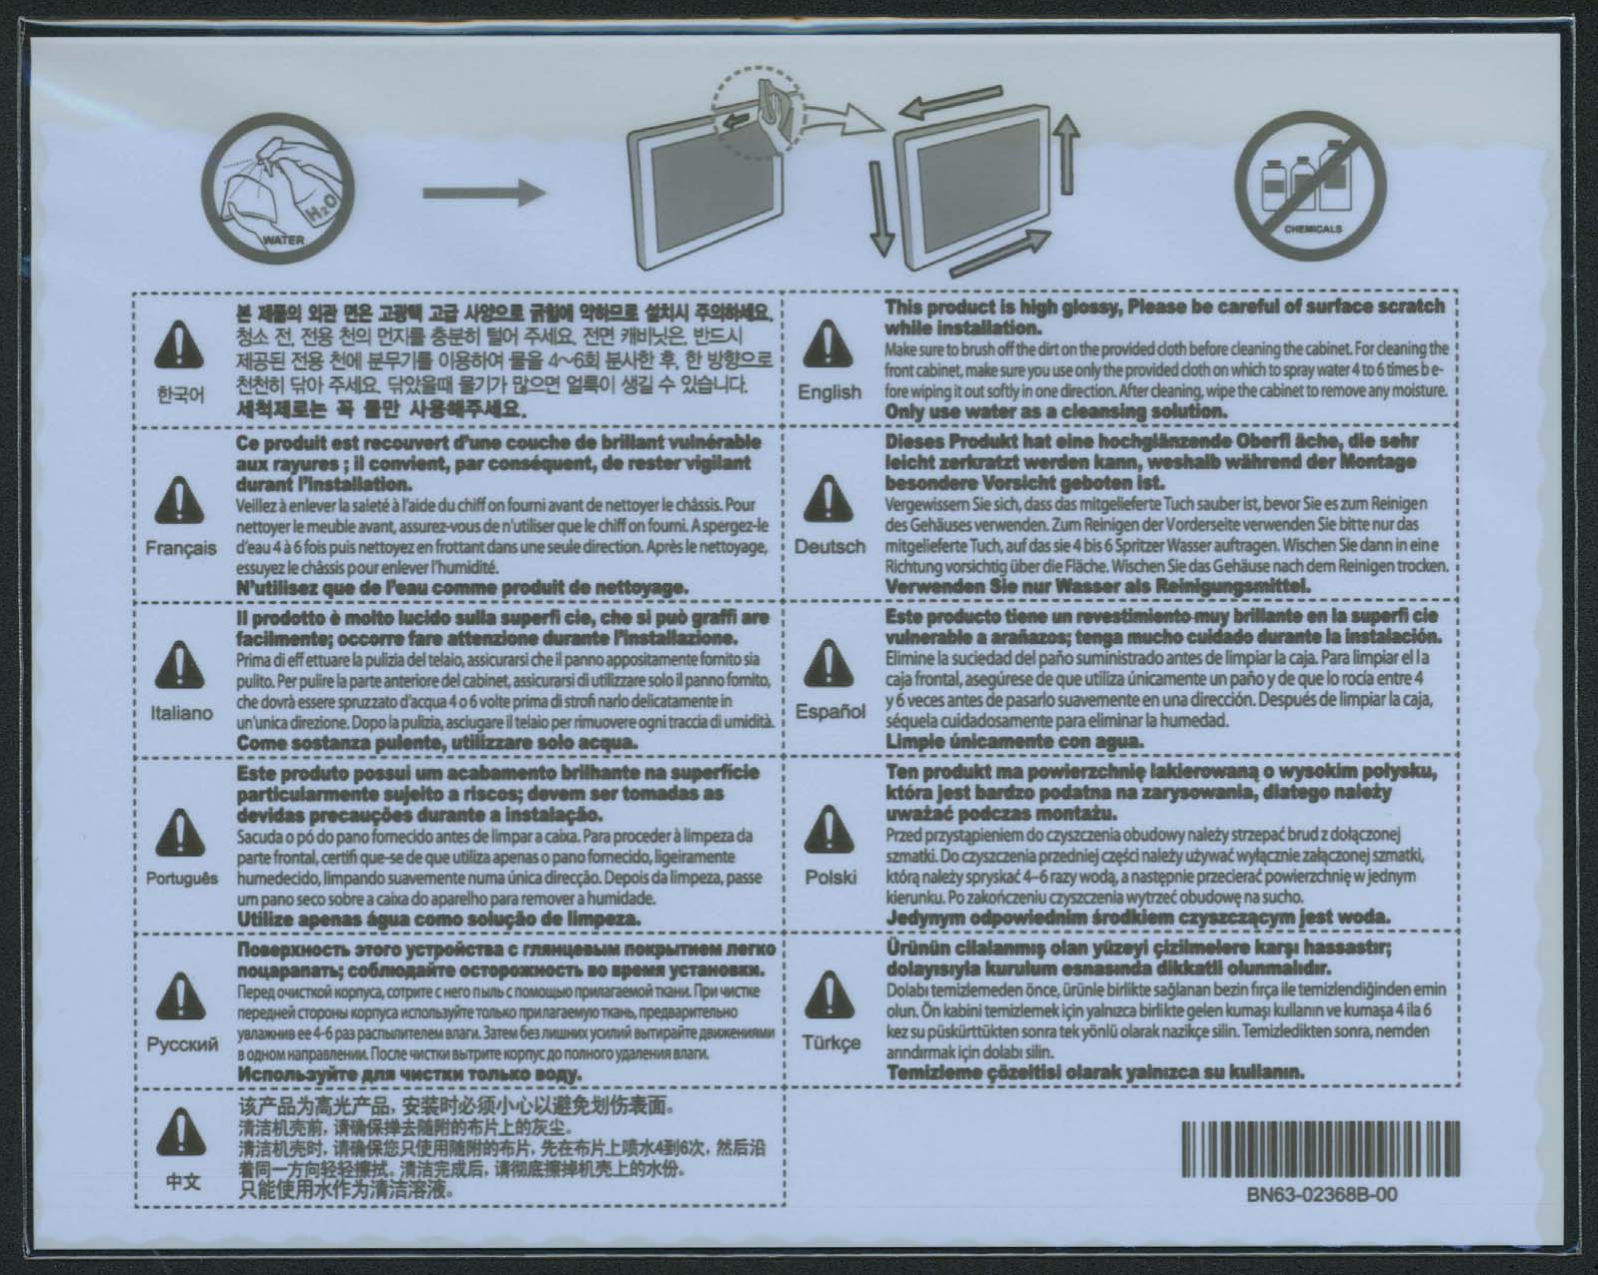 Samsung Series 6 Un46Es6580 Users Manual 30532E6500